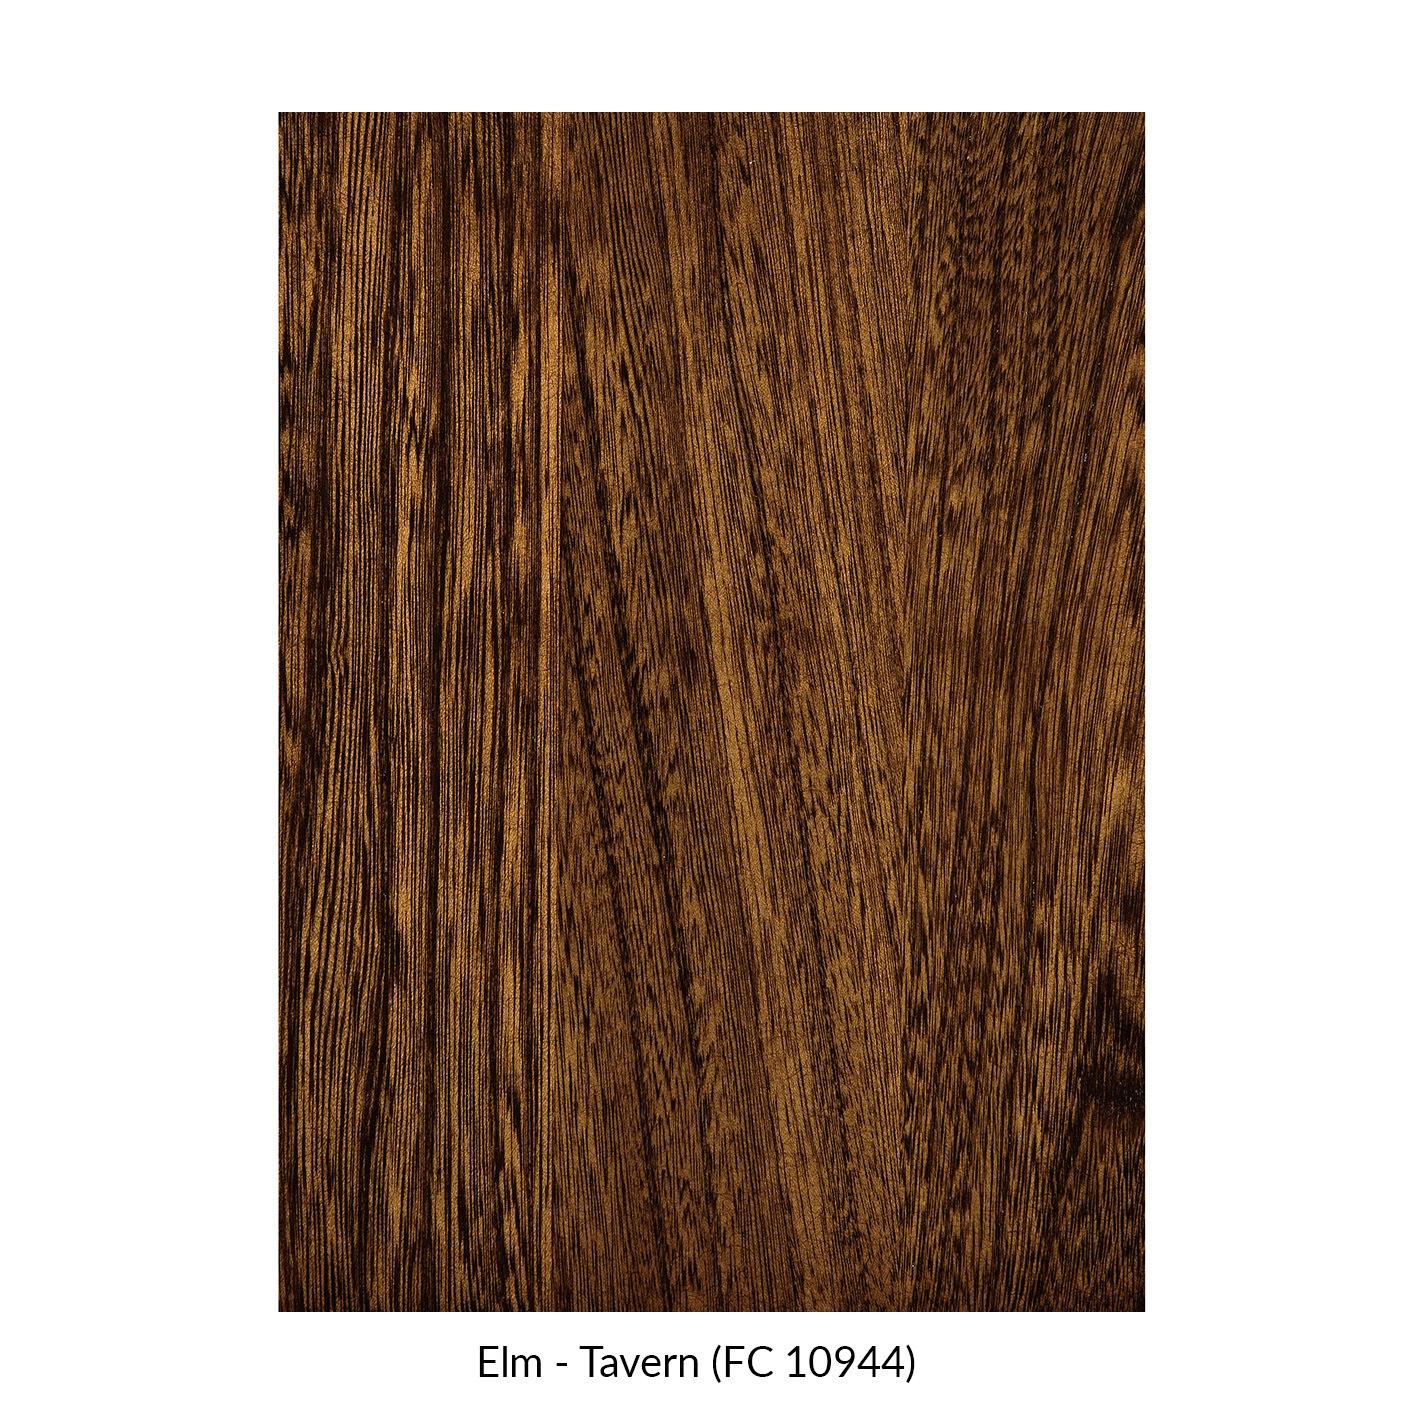 spectrum-elm-tavern-fc-10944.jpg